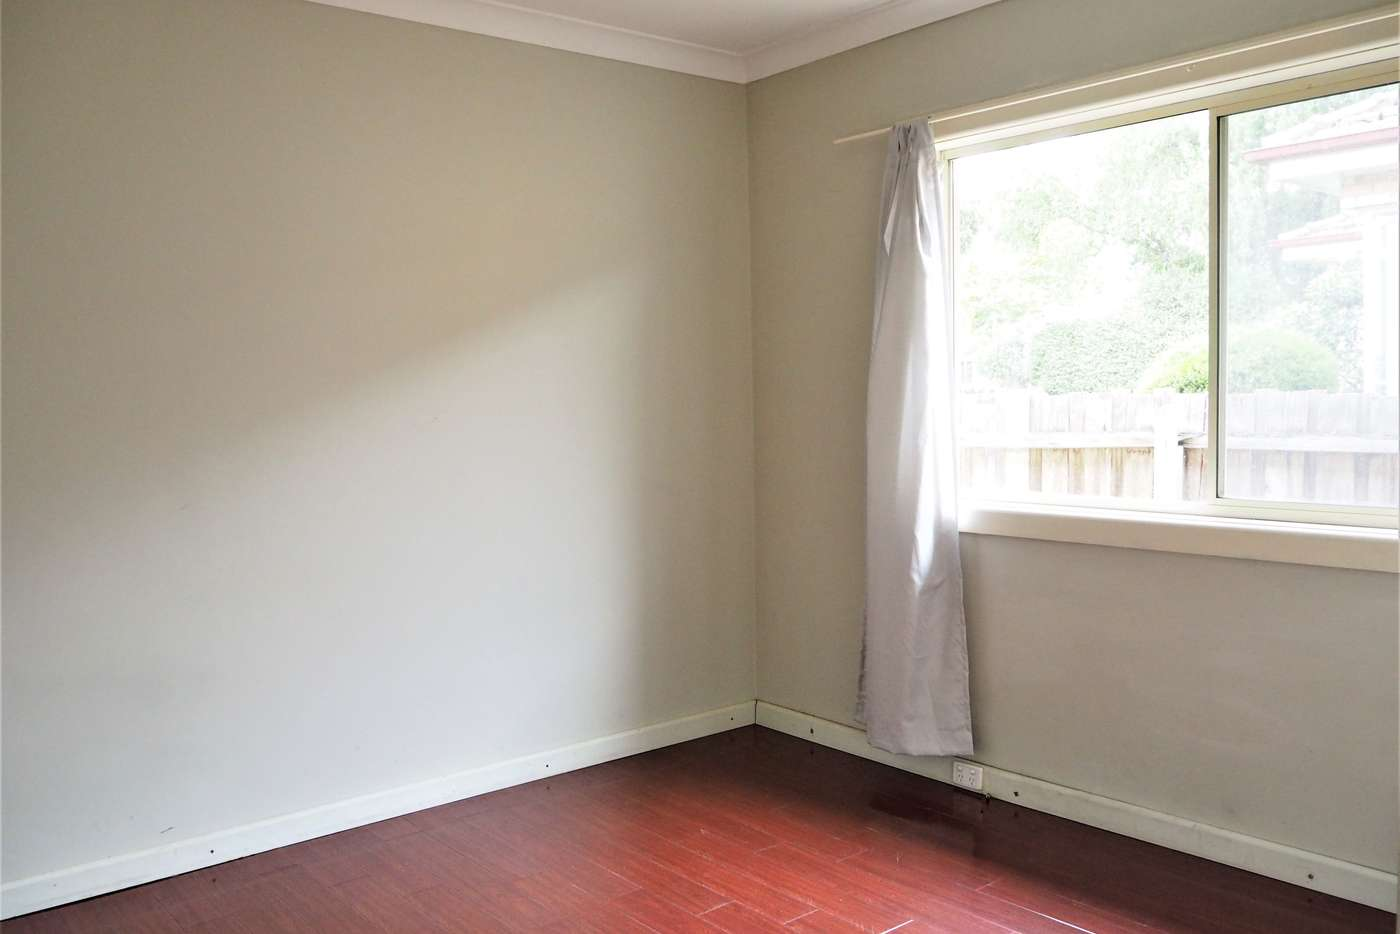 Sixth view of Homely house listing, 1/14 Breffna Street, Preston VIC 3072